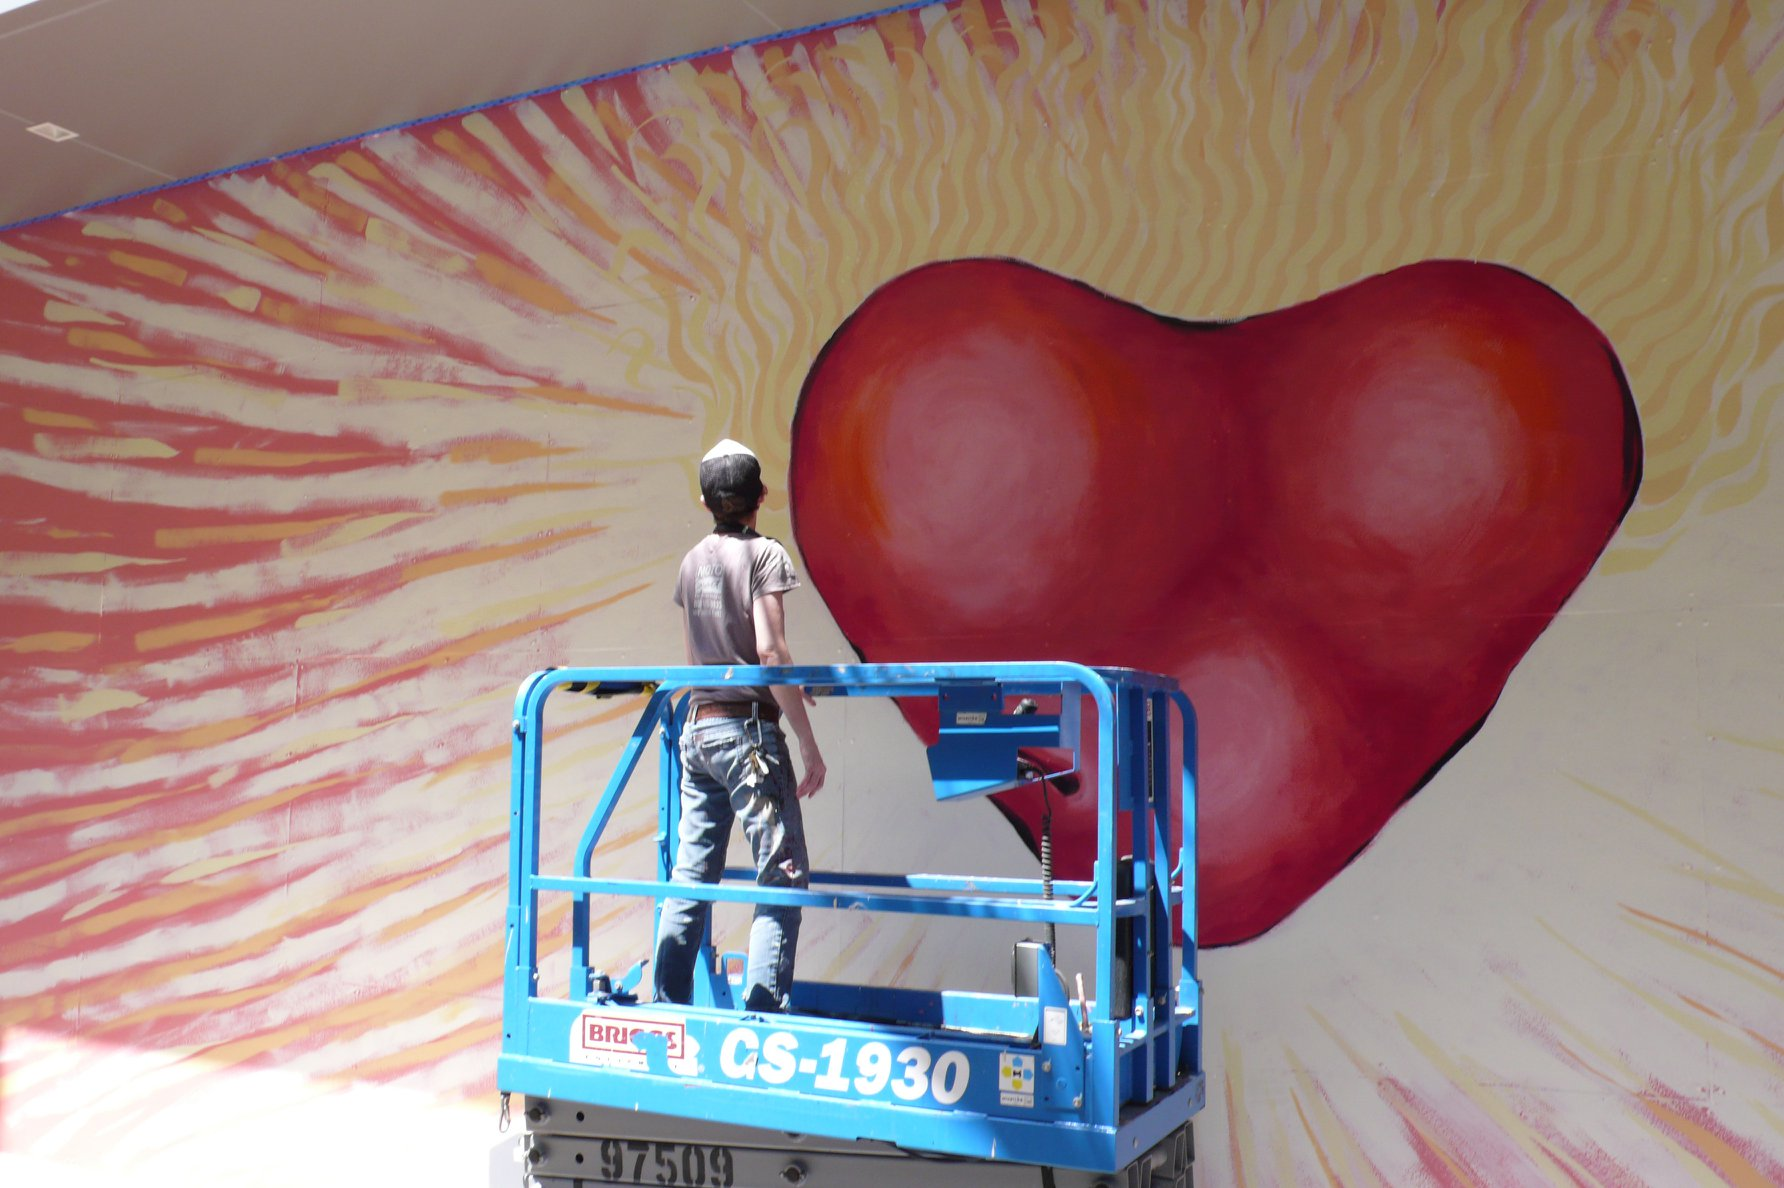 House of Blues FolkHeART mural in progress. Photo by David M. Behrman.